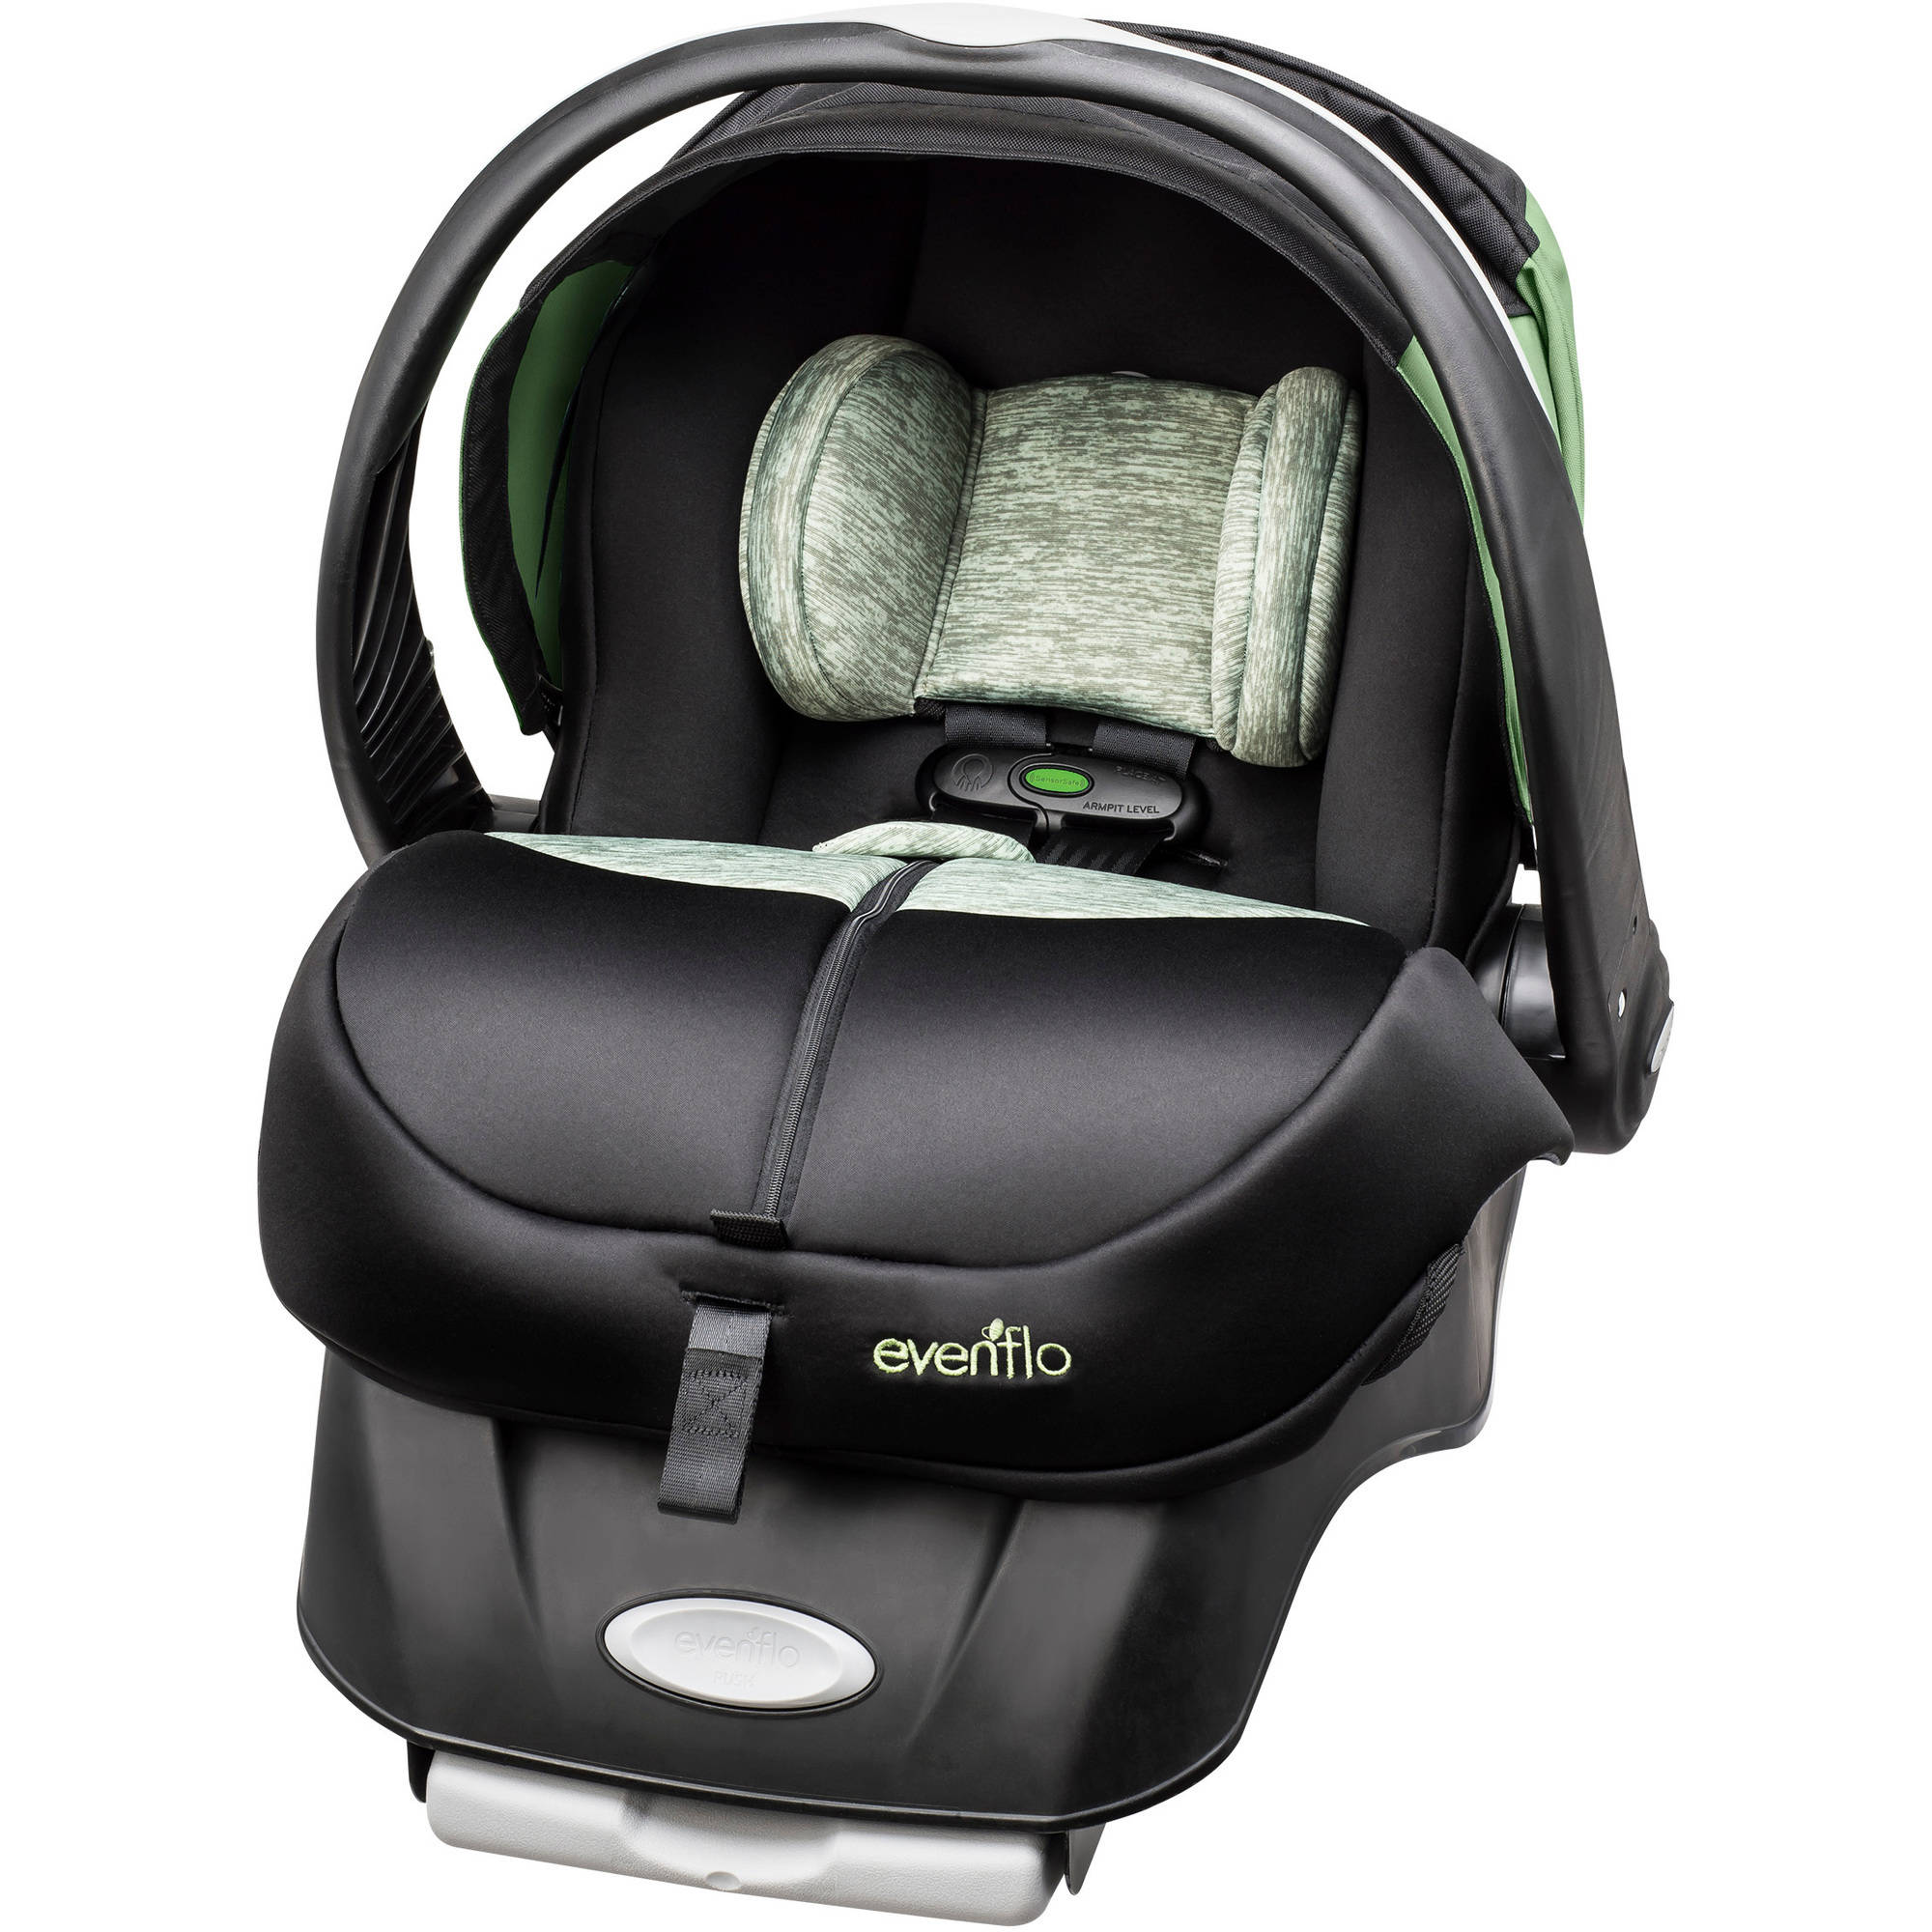 Evenflo Advanced Embrace DLX Infant Car Seat with SensorSafe, Peridot